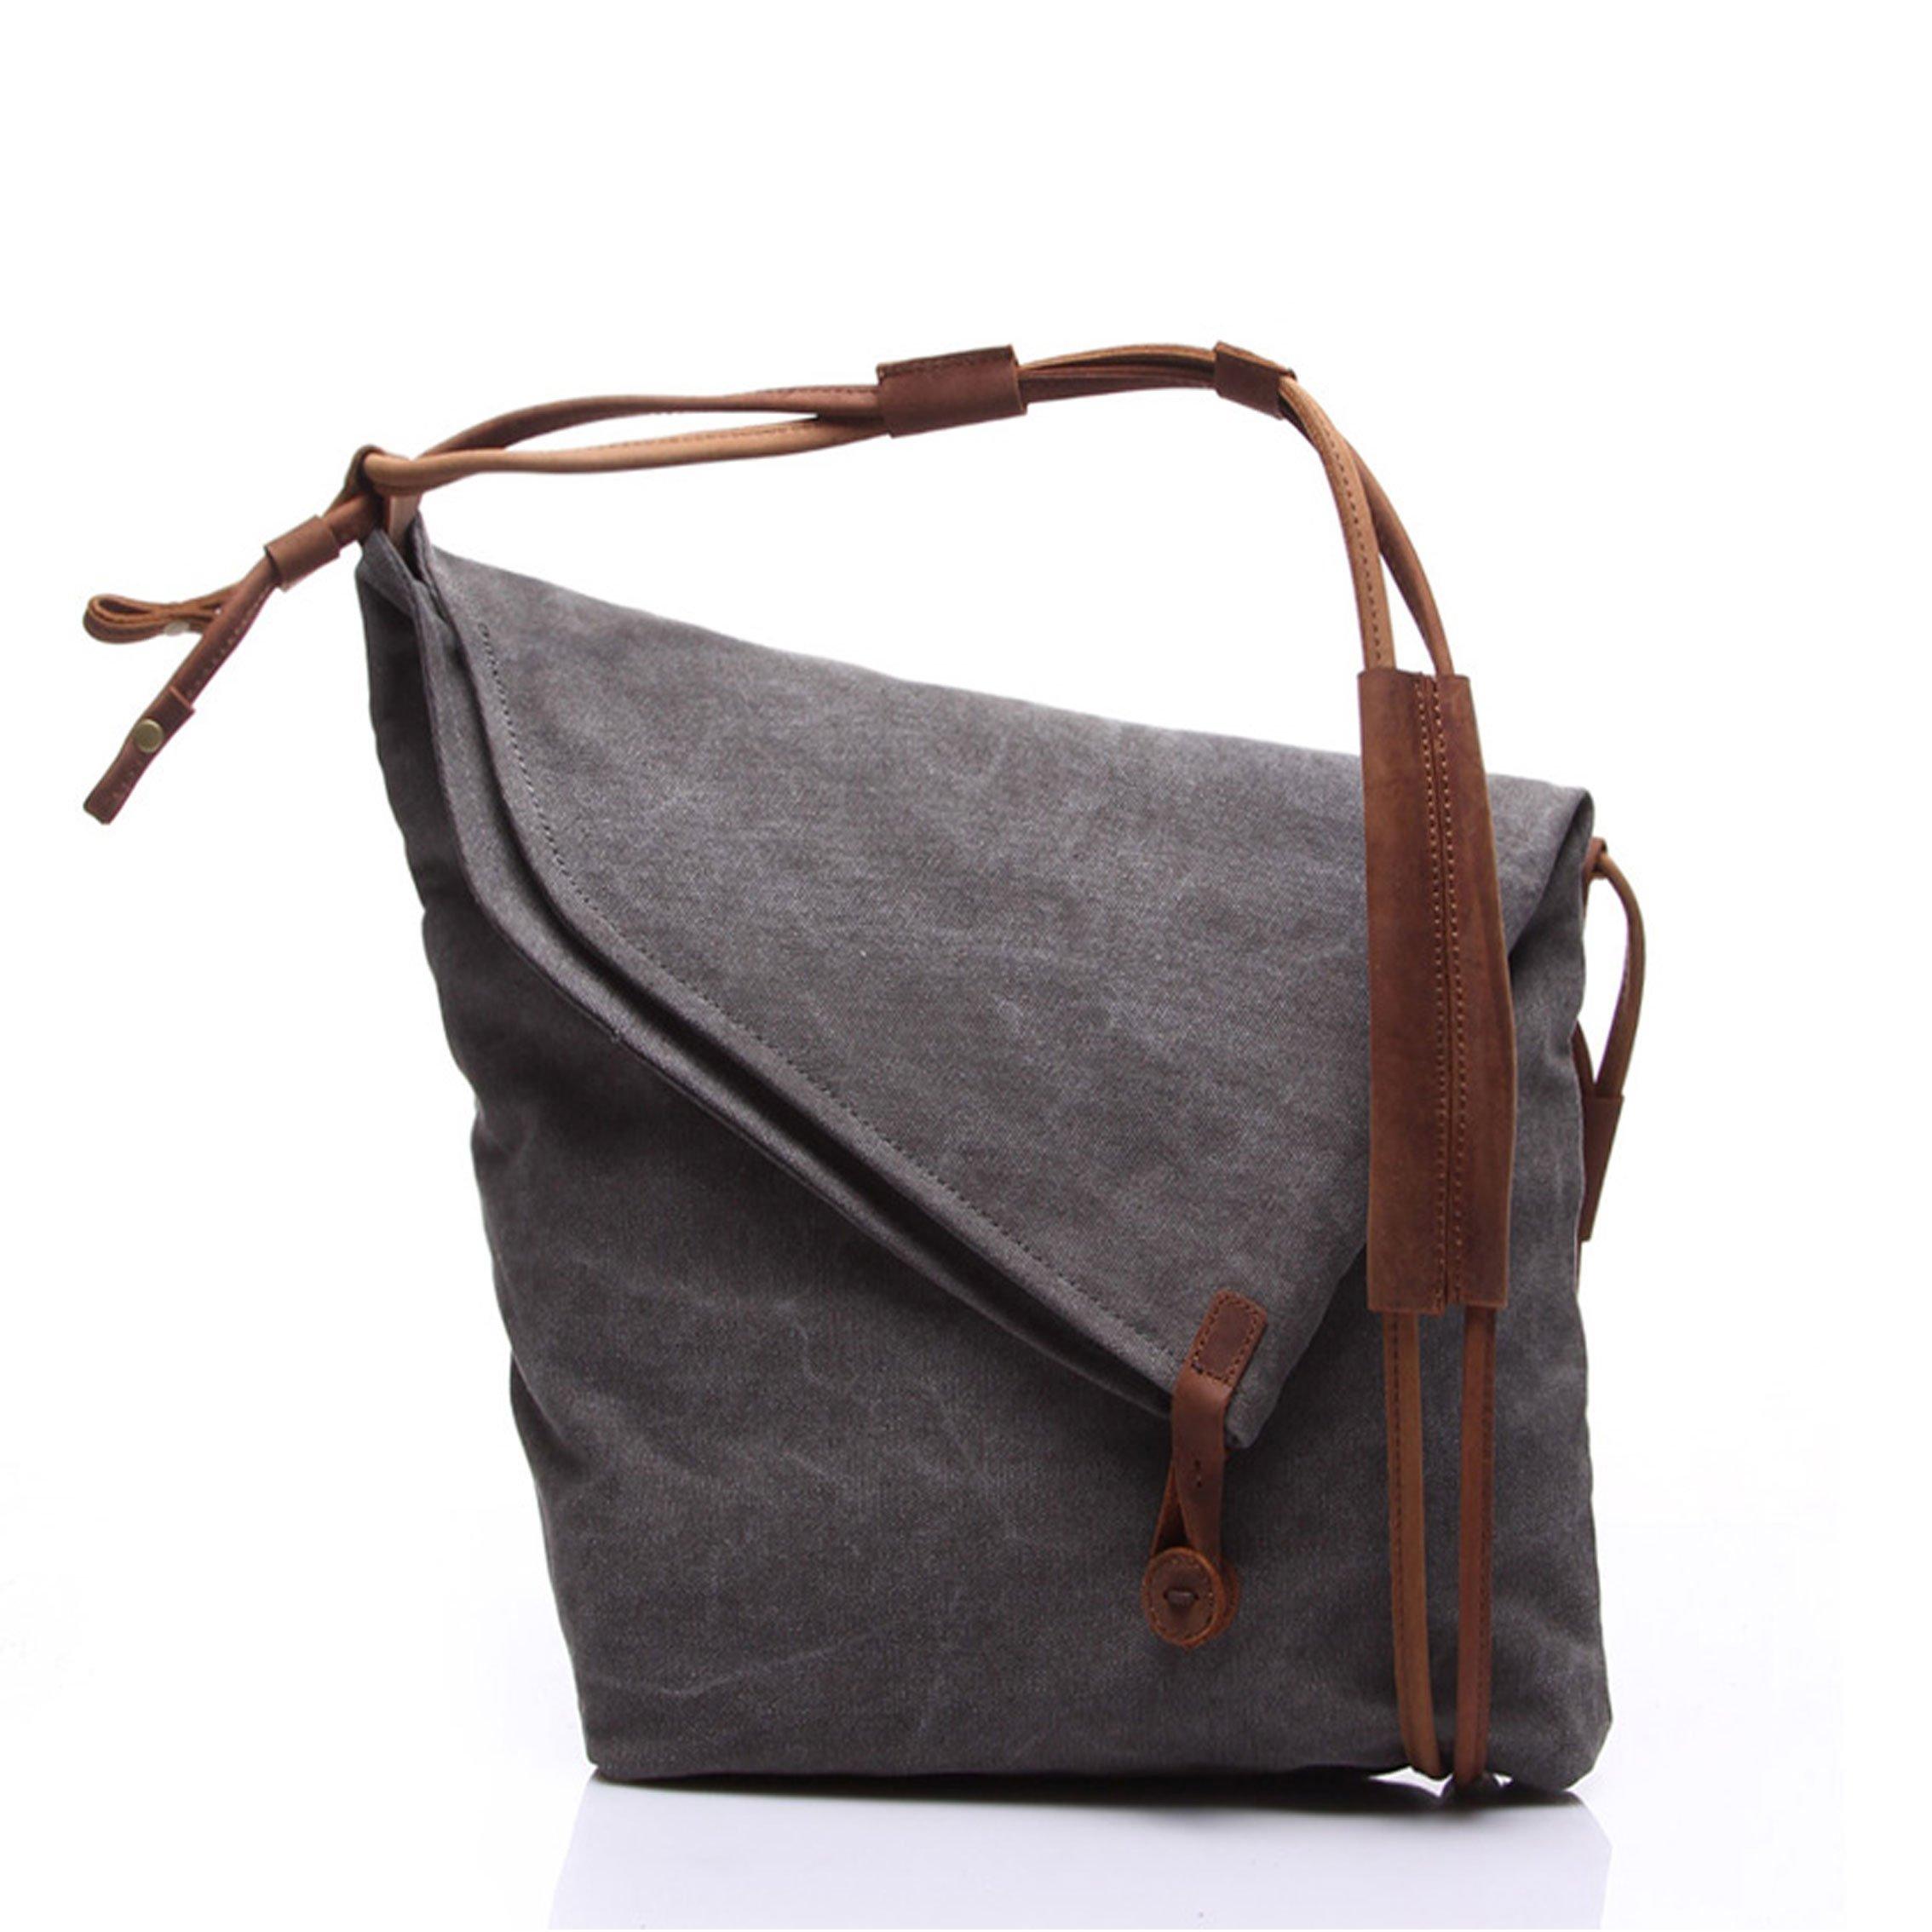 Vere Gloria Purse Canvas Messenger Bag Crossbody Shoulder Hobo Handbags for Women and men (Gray)